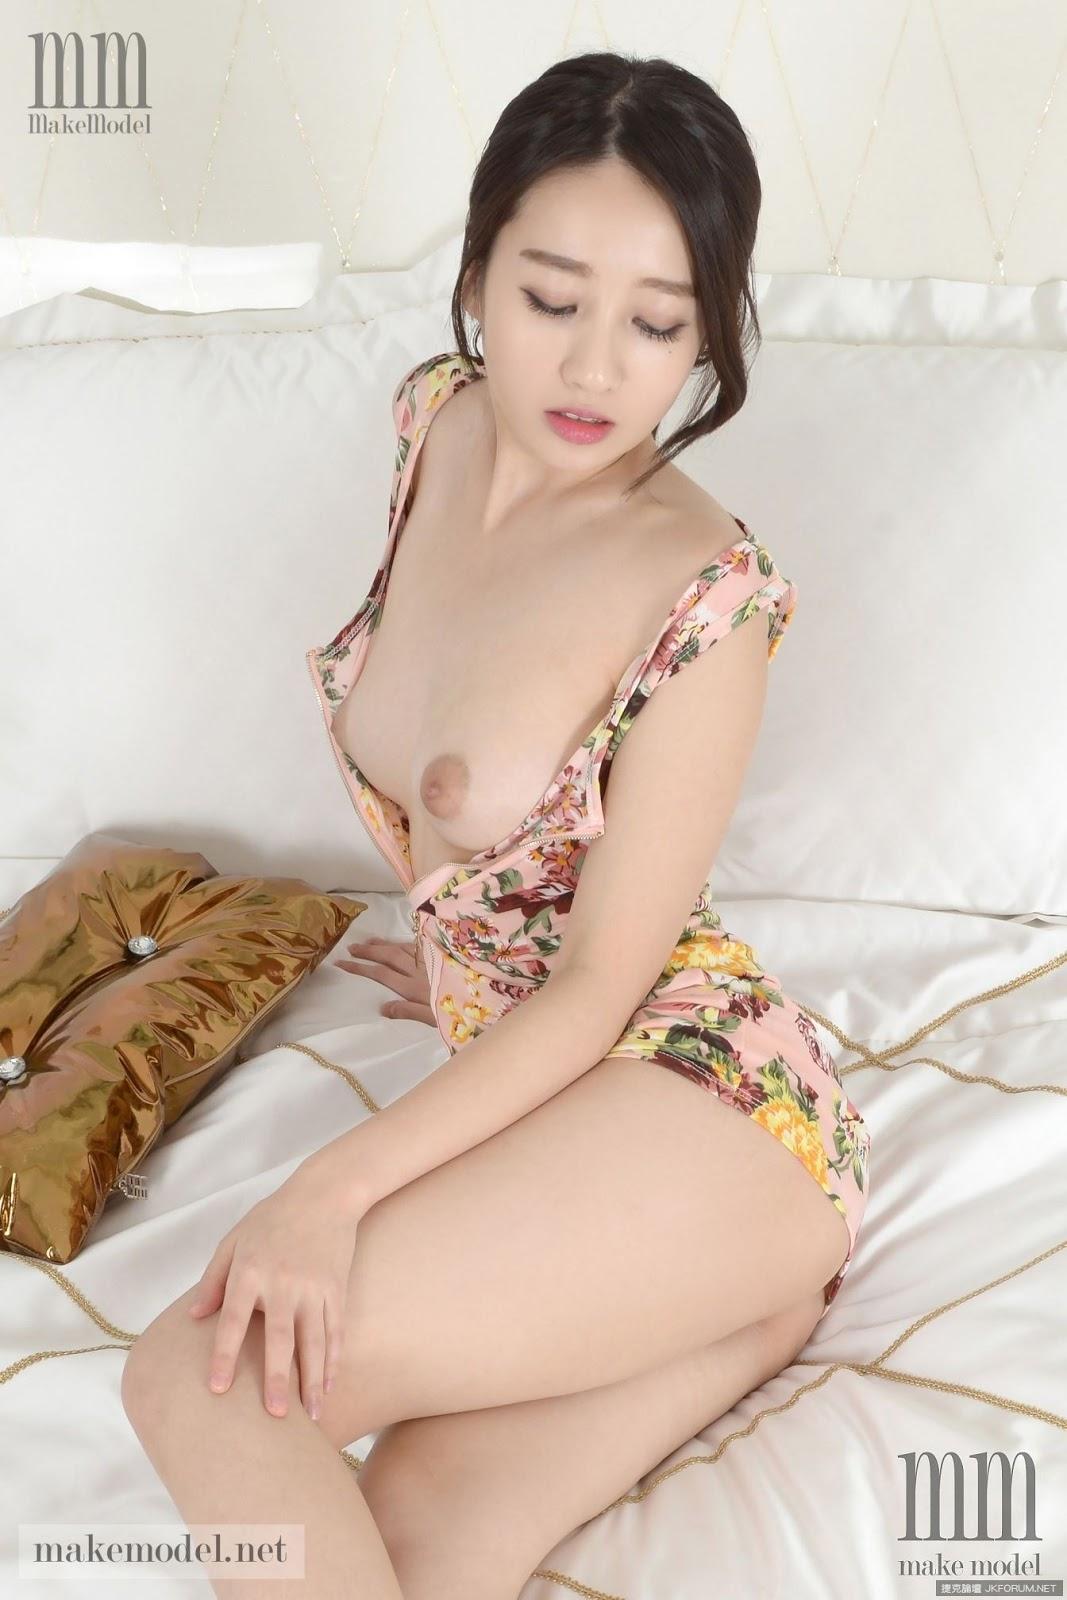 Nude model of korea